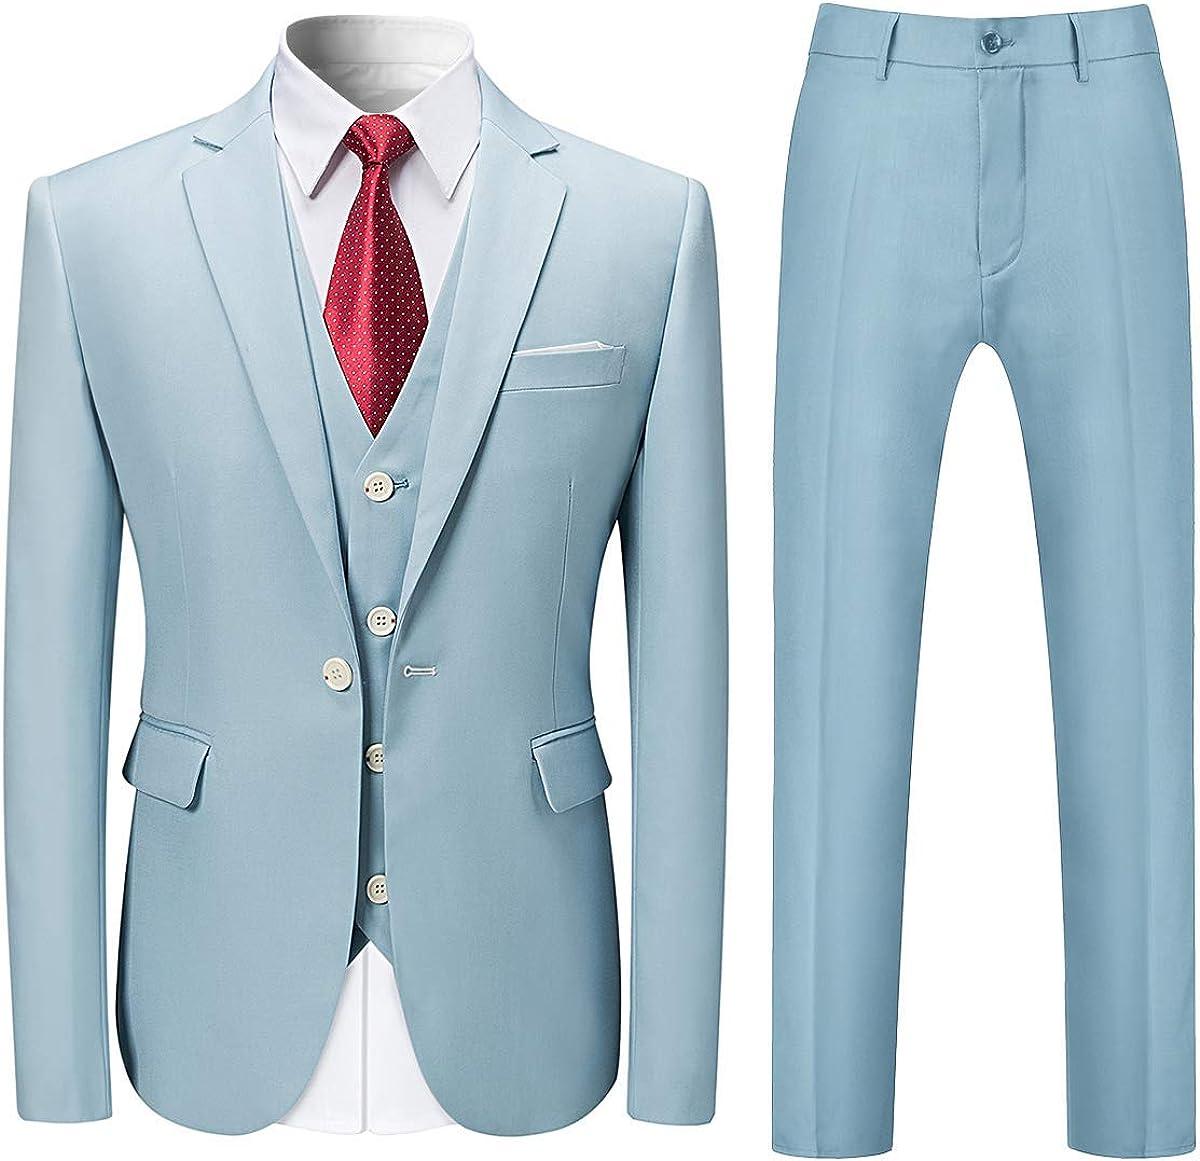 HOTK Men's Suits Custom Made 3 Piece Solid Notch Lapel Business Suits Groom Tuxedos Light Blue